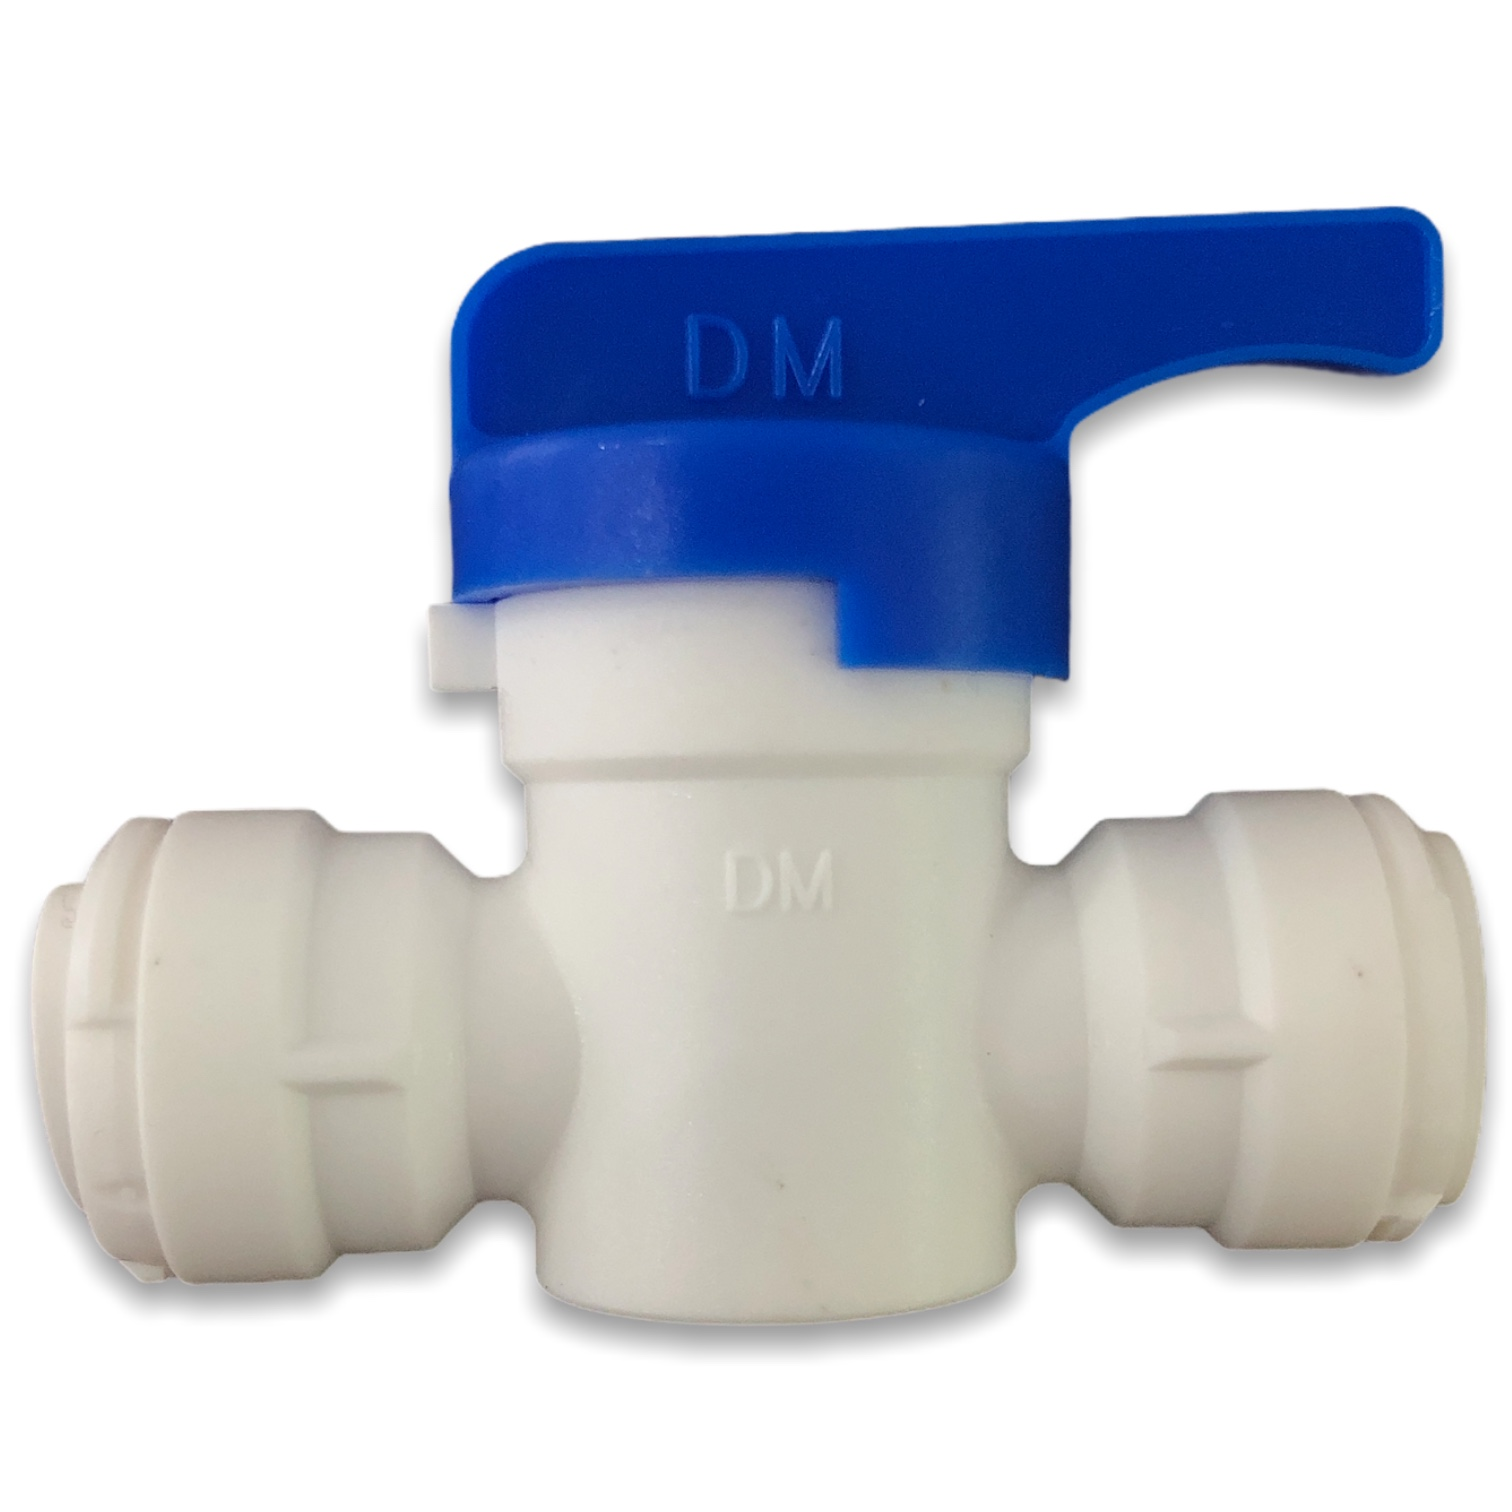 DMFIT - Válvula manual com união tubo 3/8 x tubo 3/8